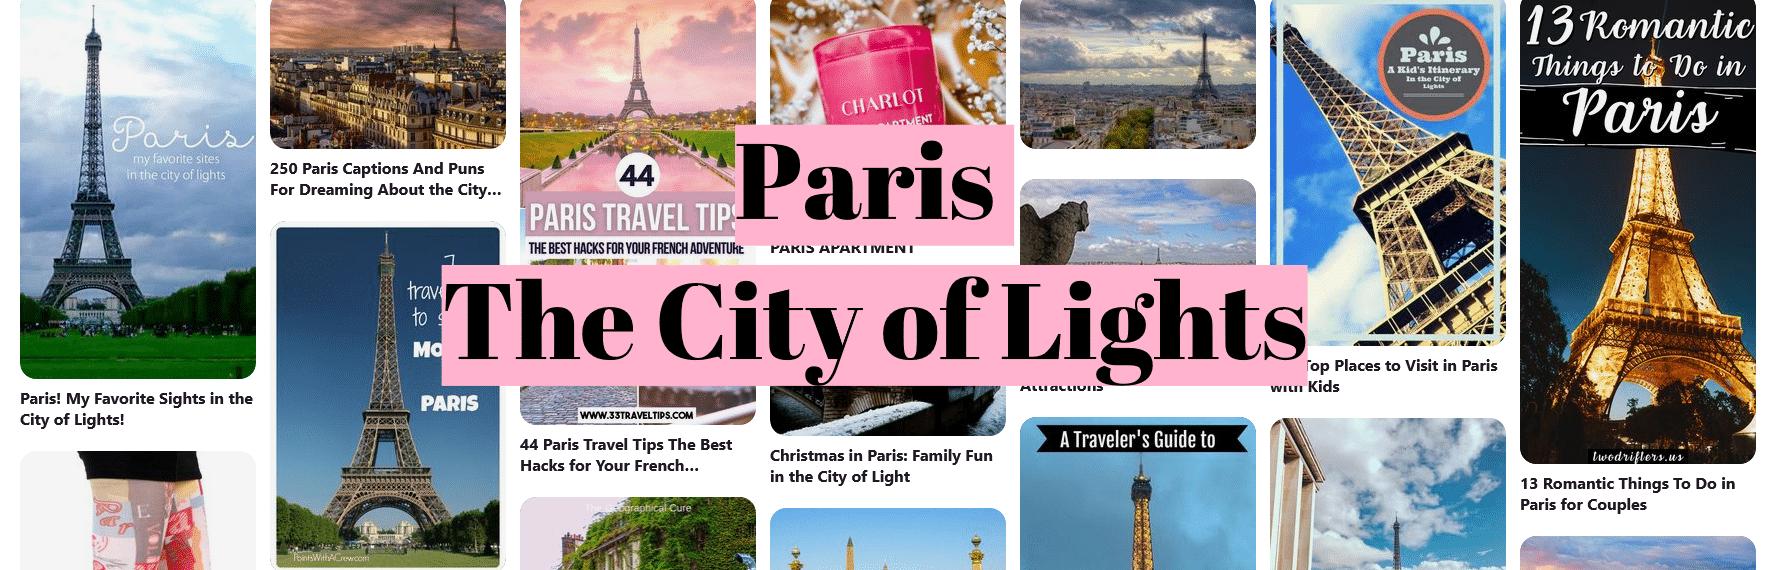 Paris The City of Lights